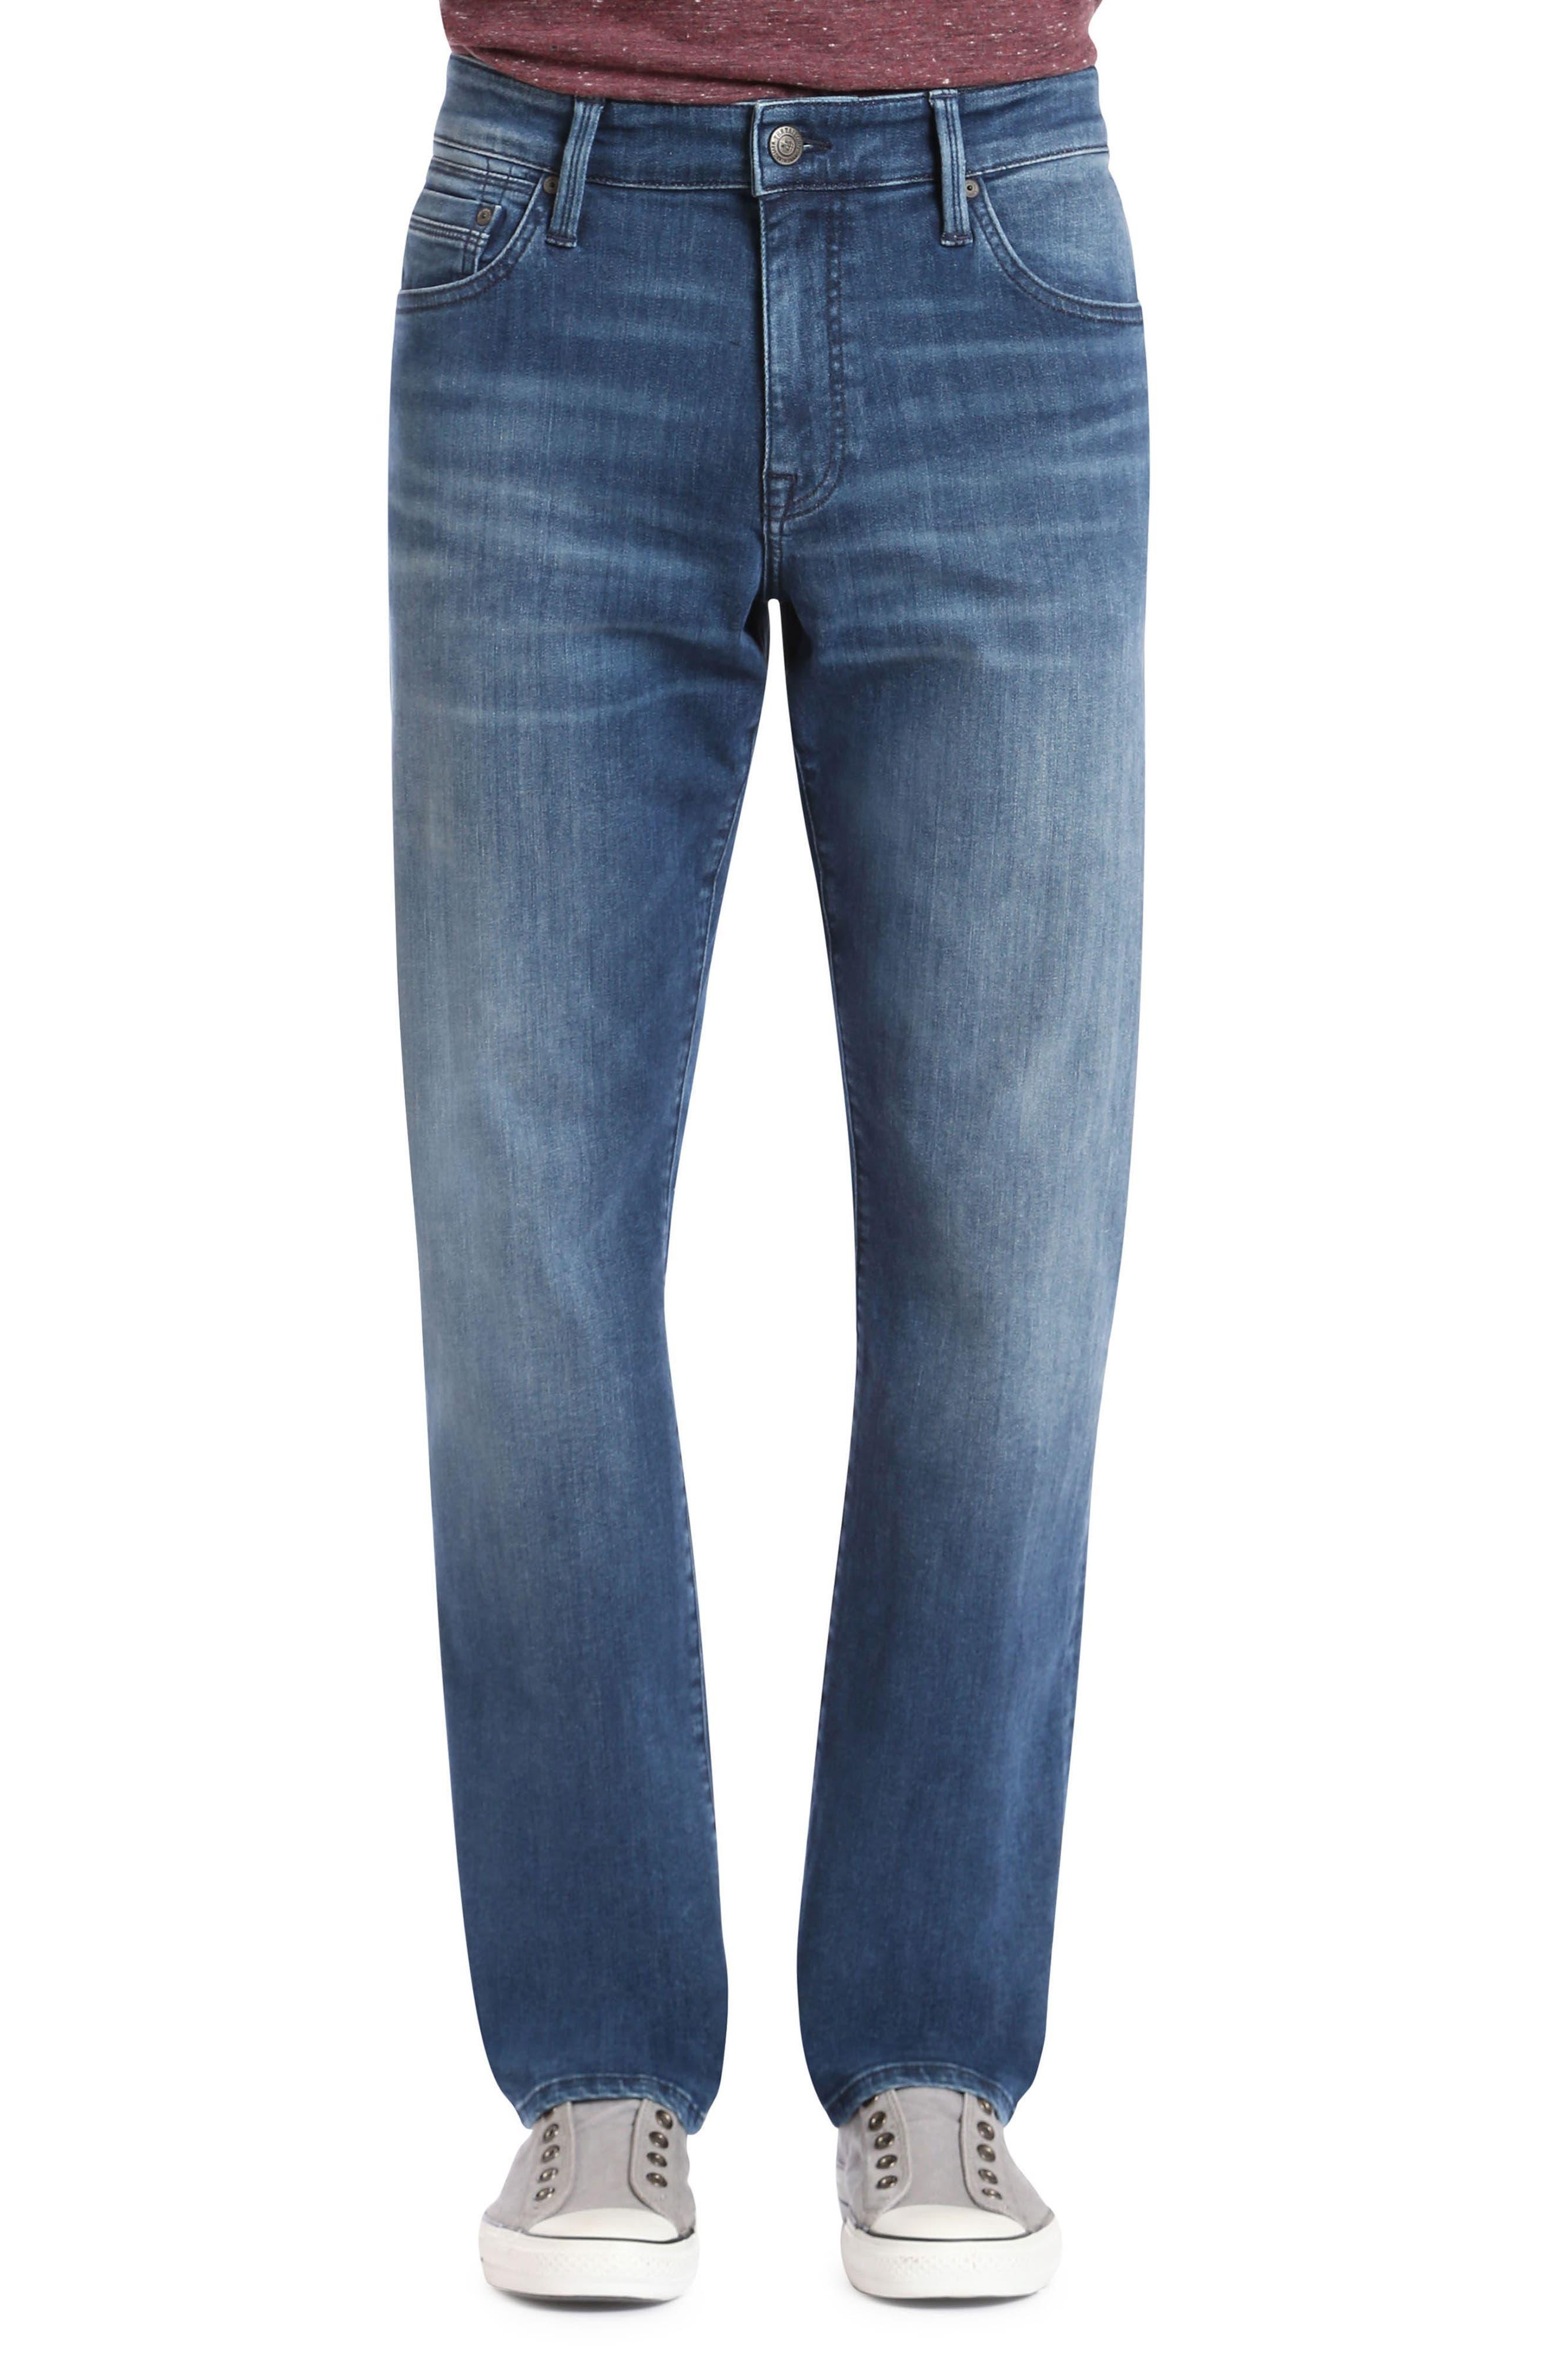 Myles Straight Leg Jeans,                             Main thumbnail 1, color,                             Mid Tonal Williamsburg